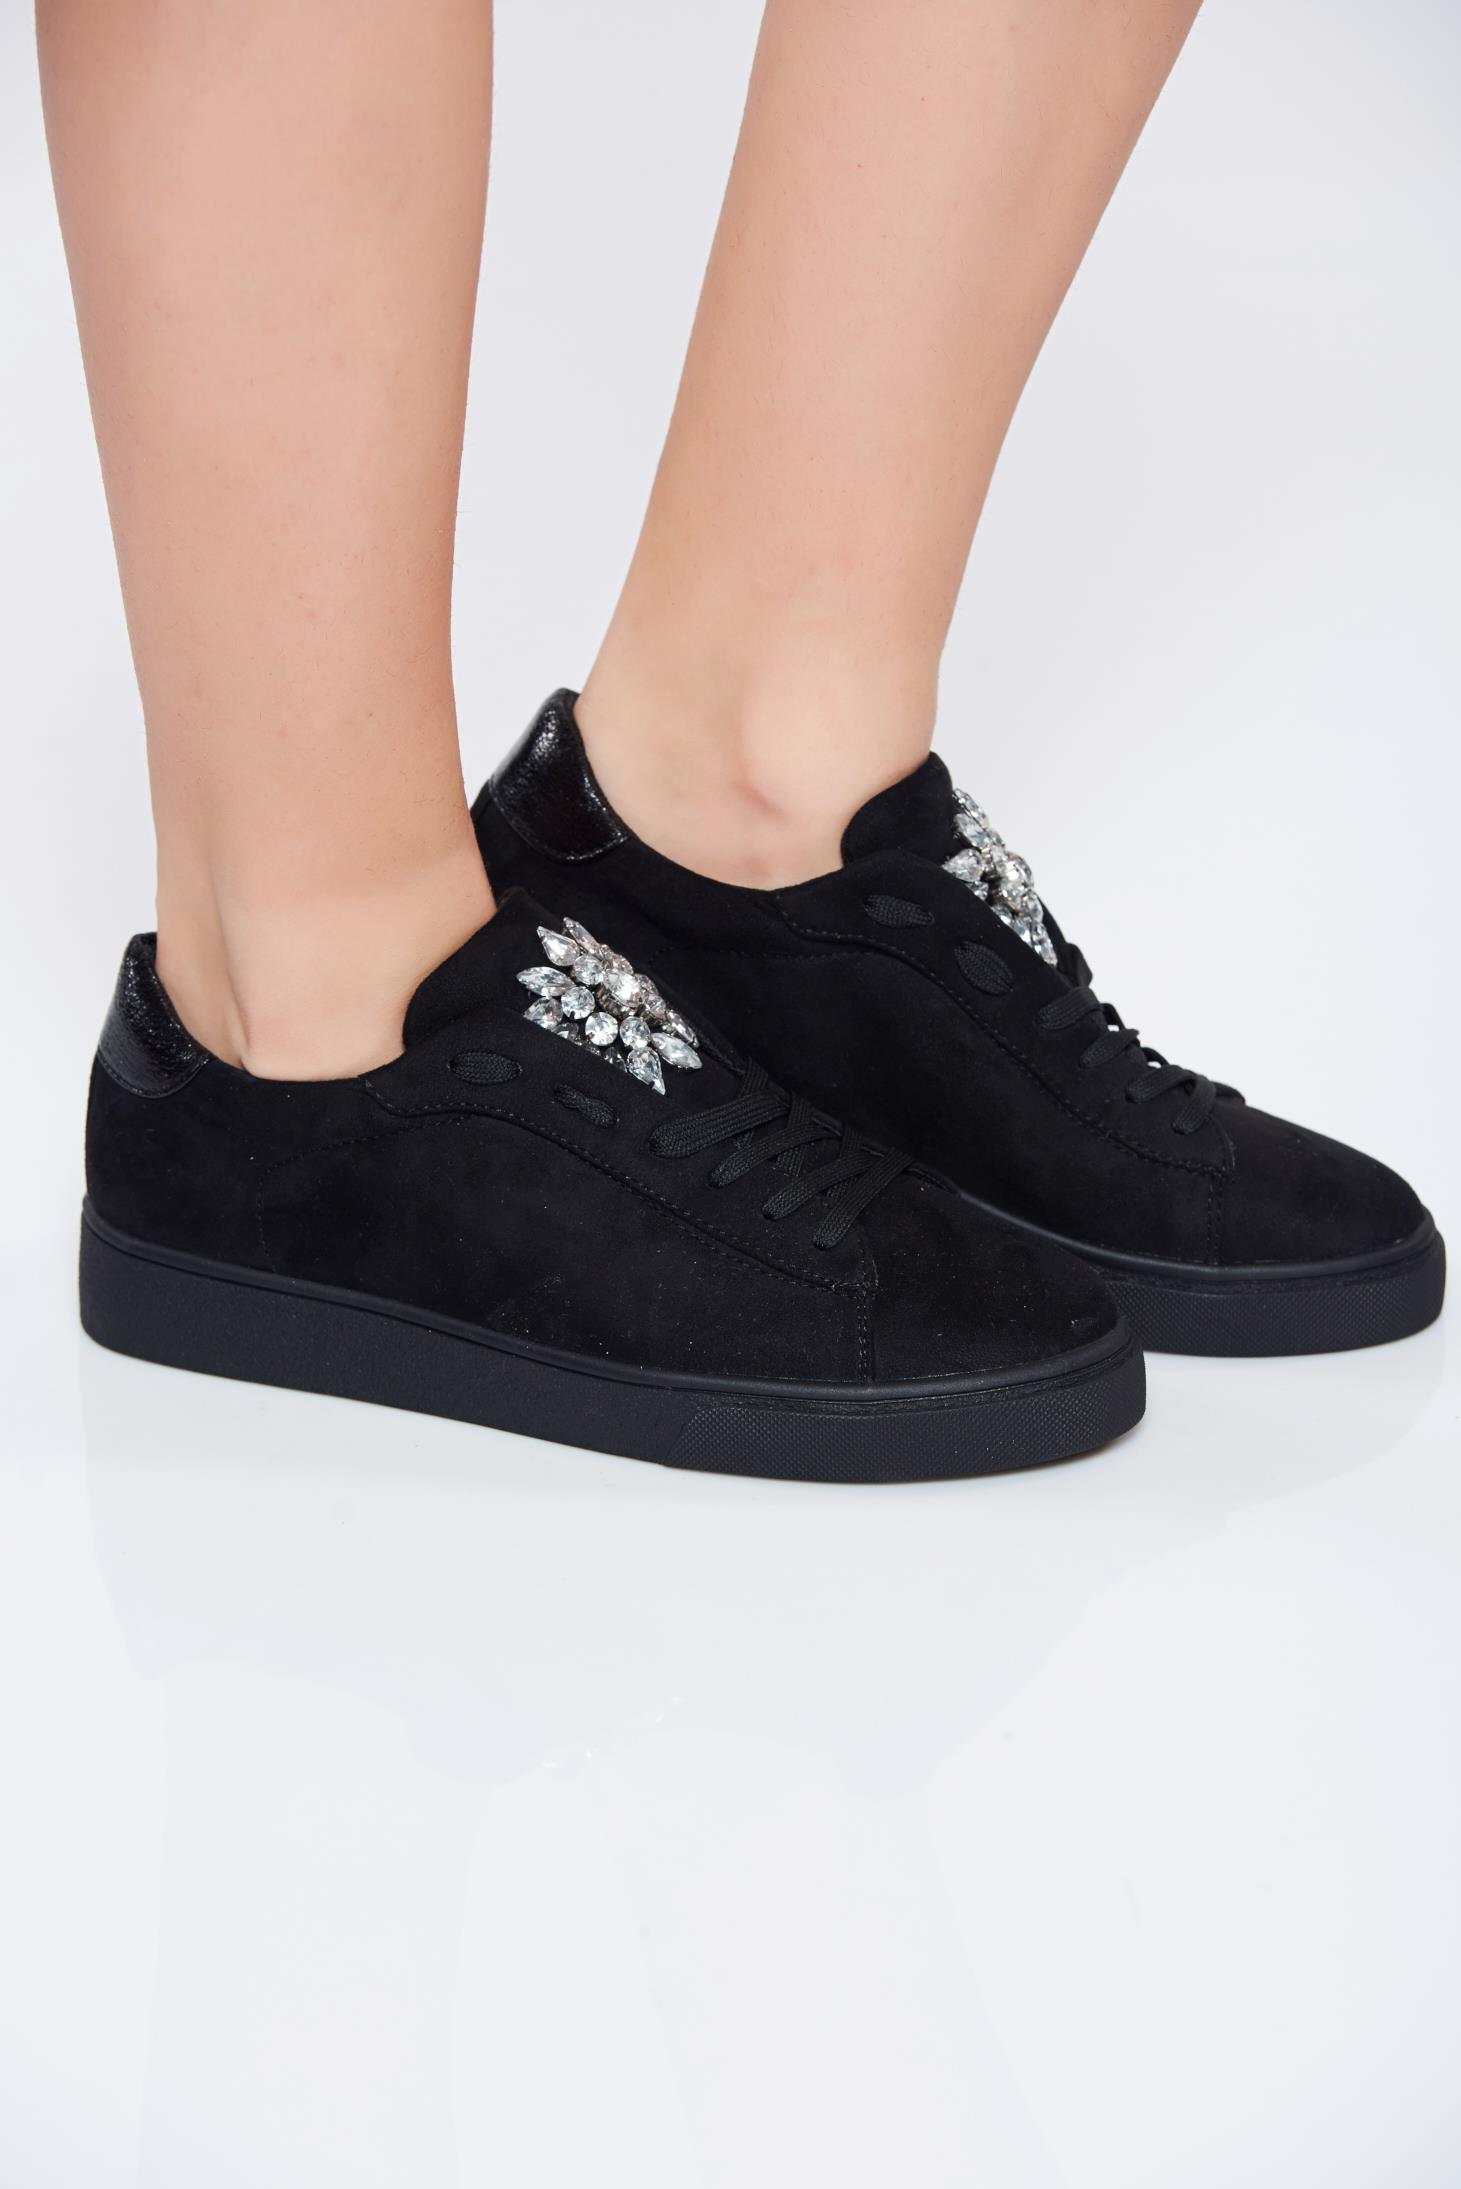 Pantofi sport negri casual cu talpa joasa cu pietre strass